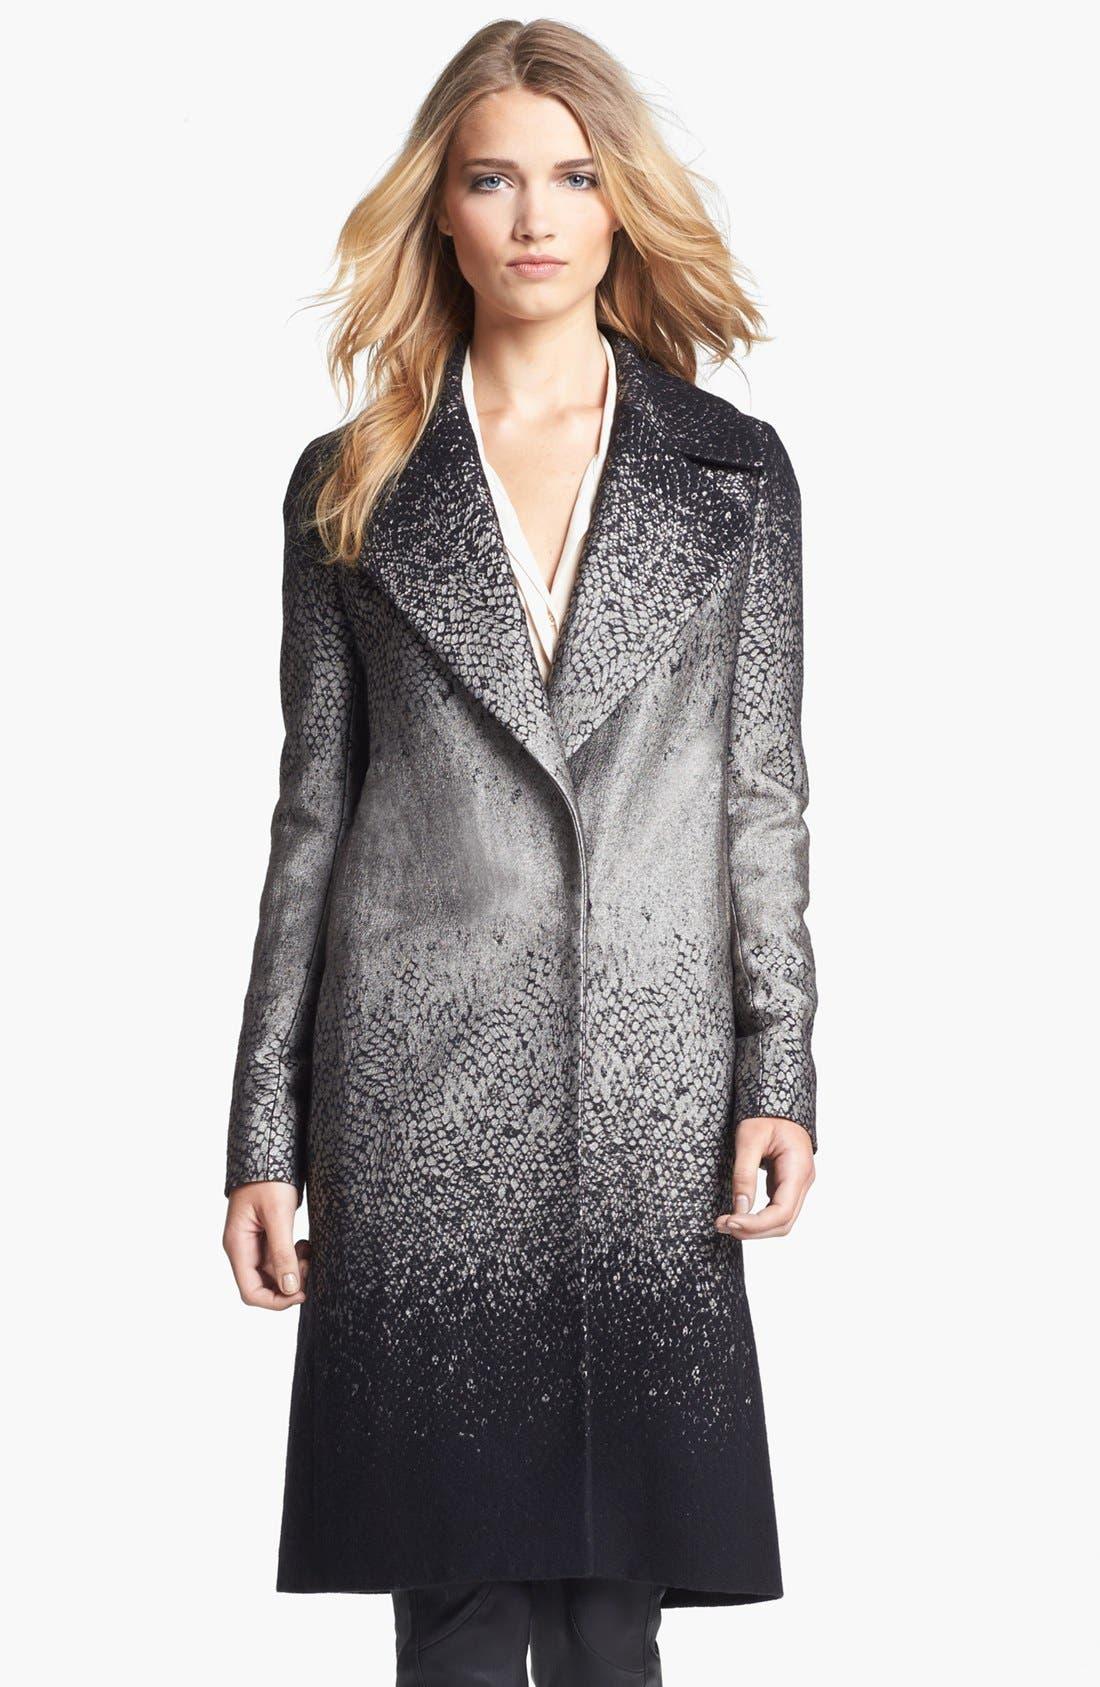 Alternate Image 1 Selected - Diane von Furstenberg 'Nala' Woven Coat